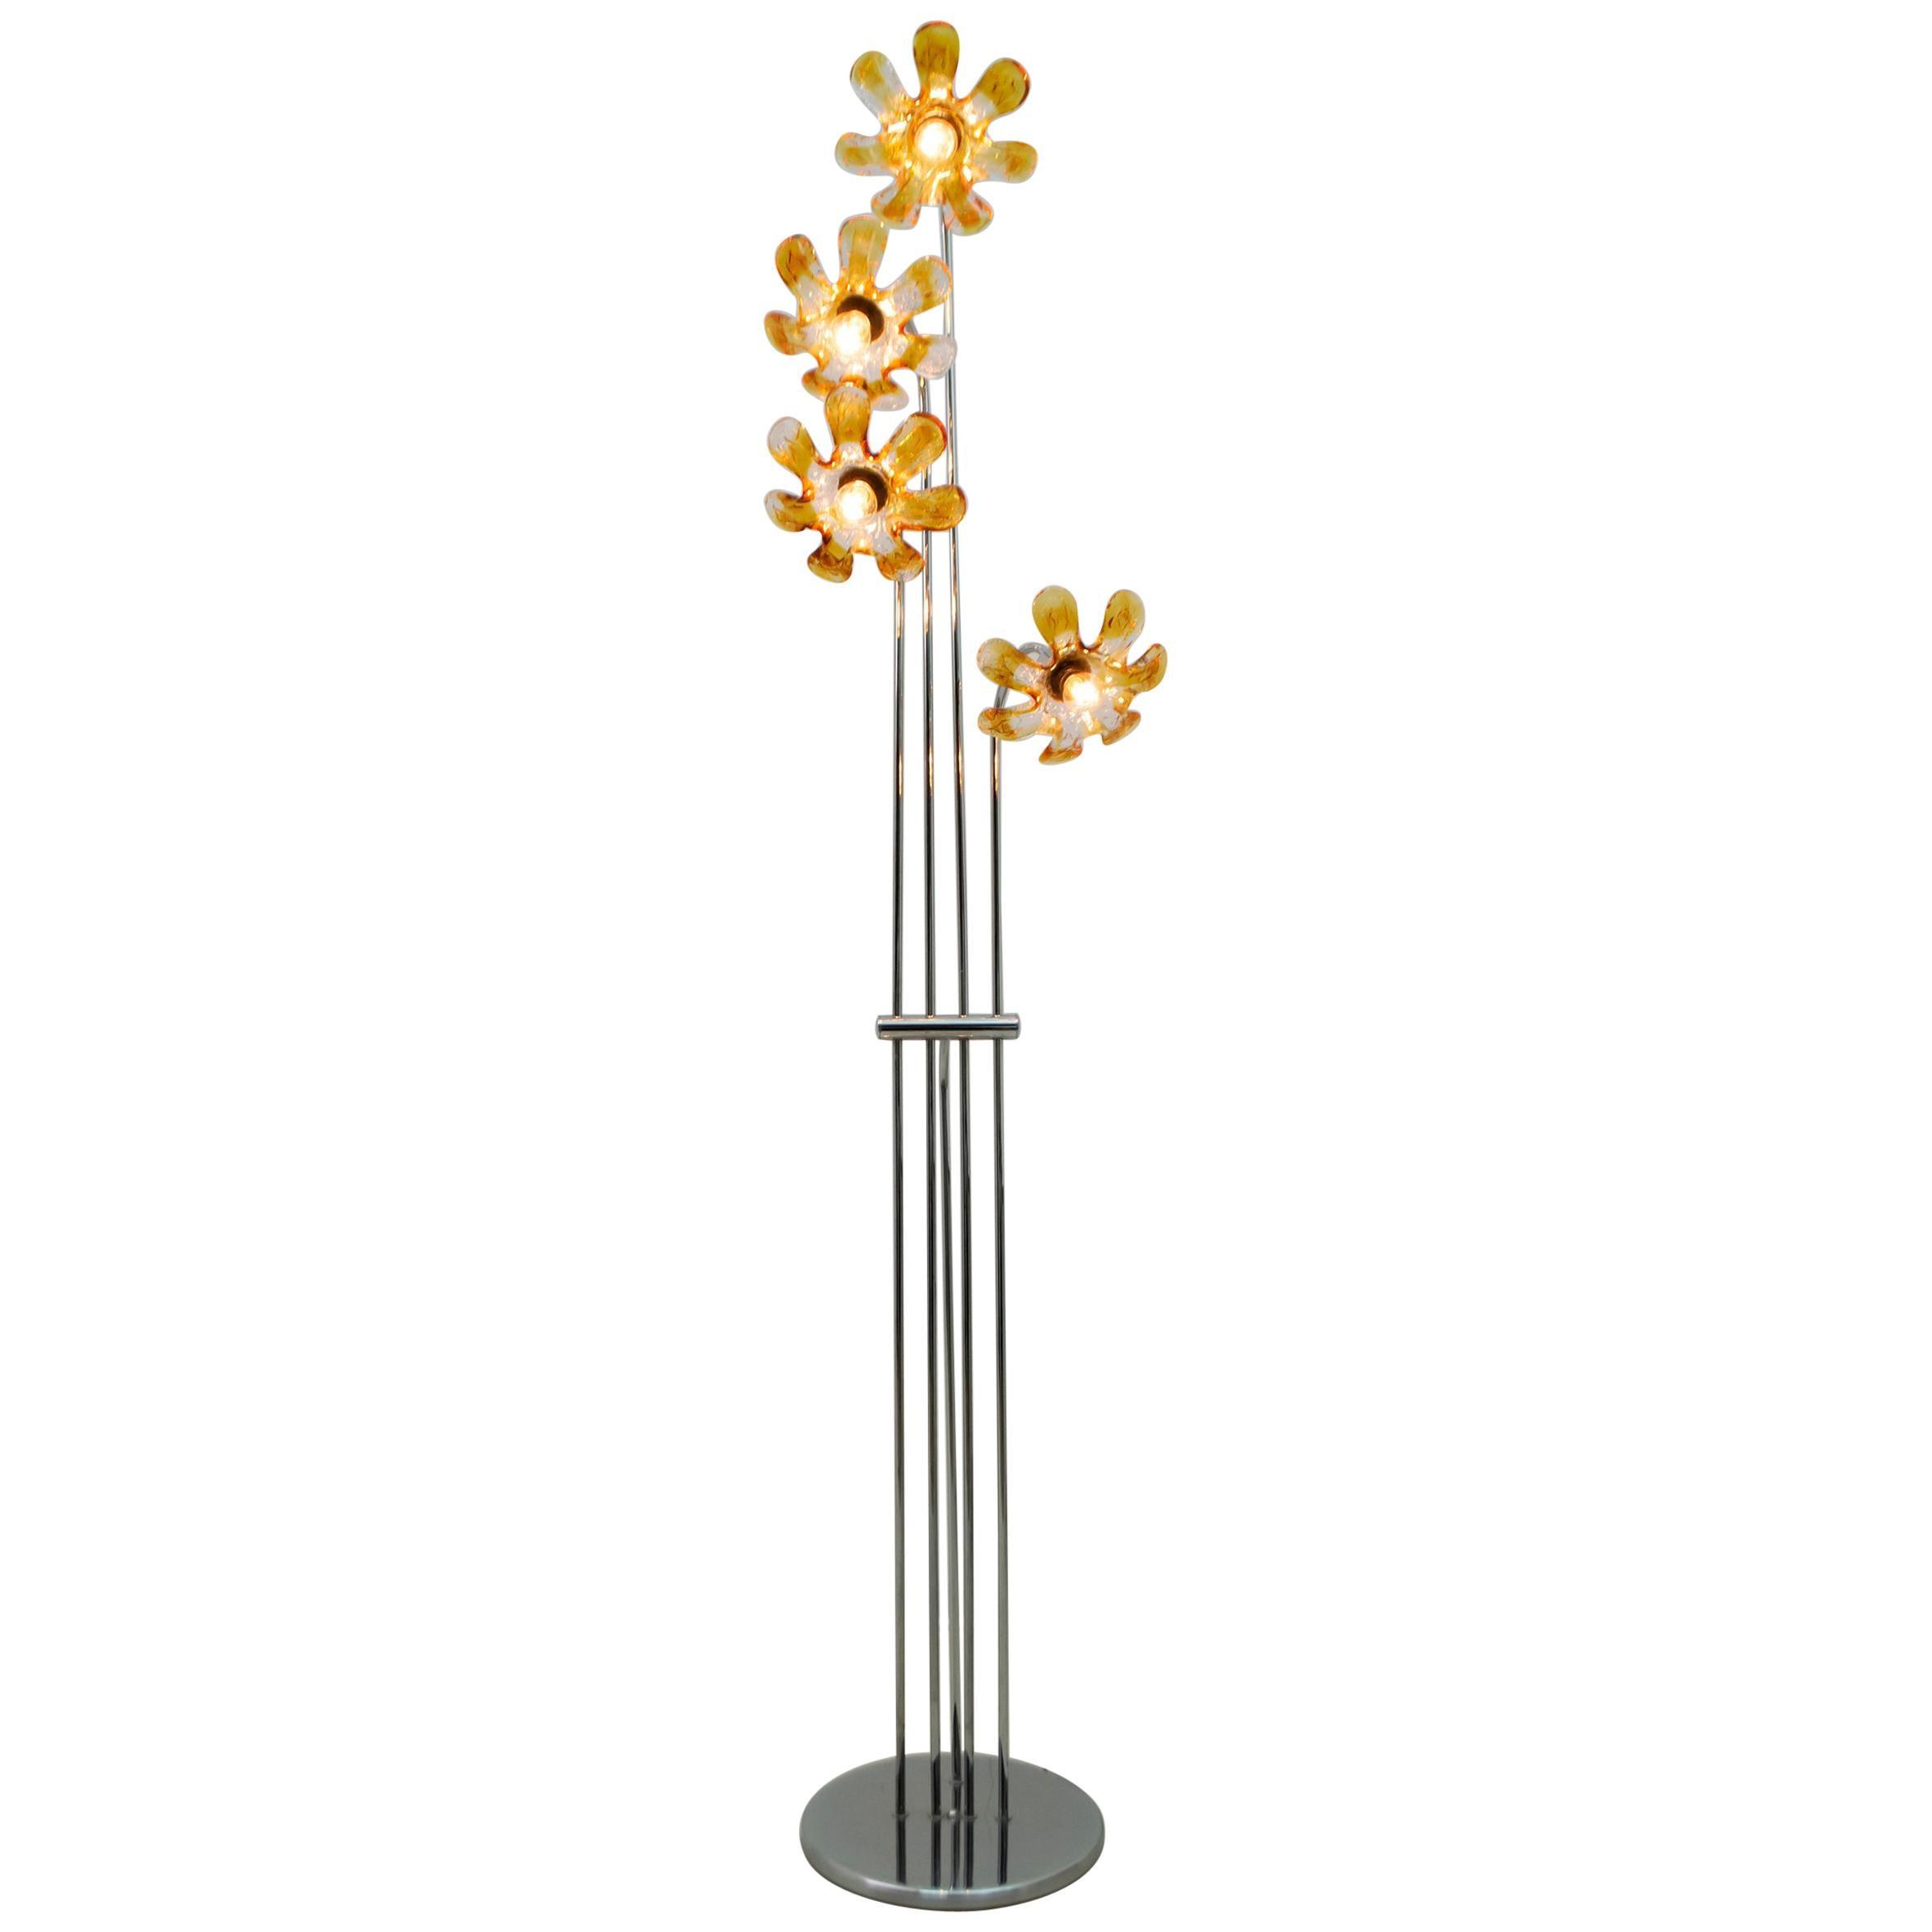 Mazzega Mid-Century Modern Italian Chrome and Murano Flowers Floor Lamp, 1970s